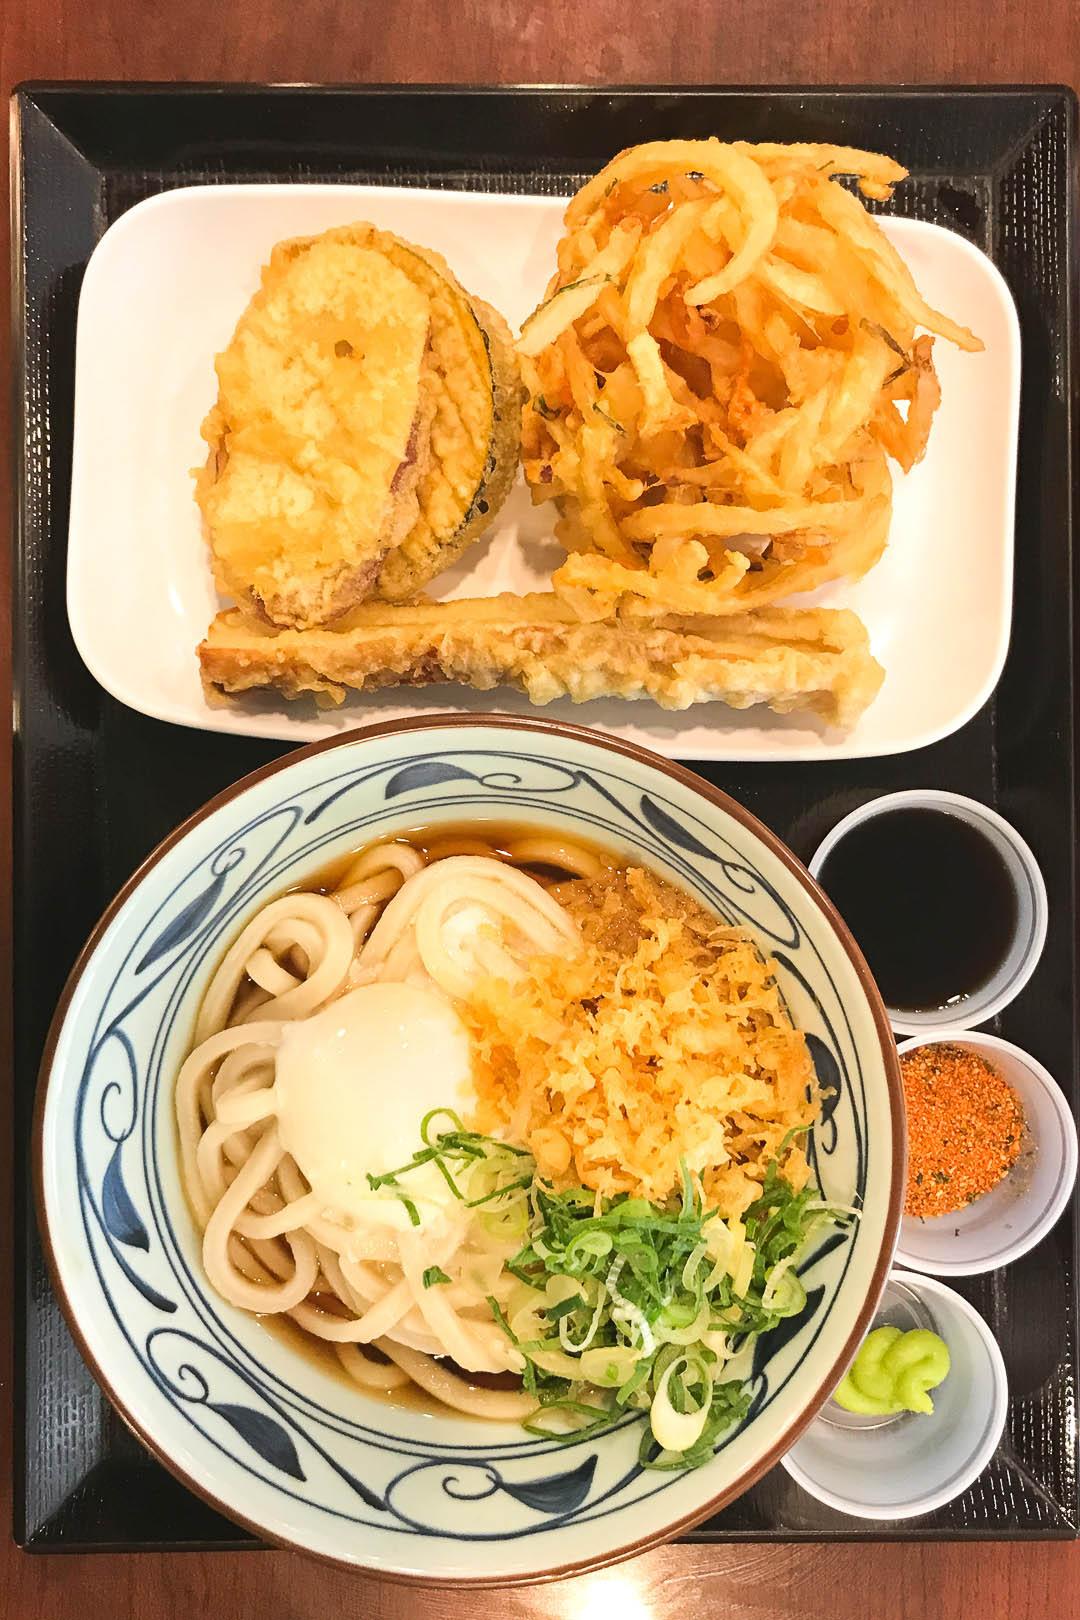 Marukame Udon and Tempura